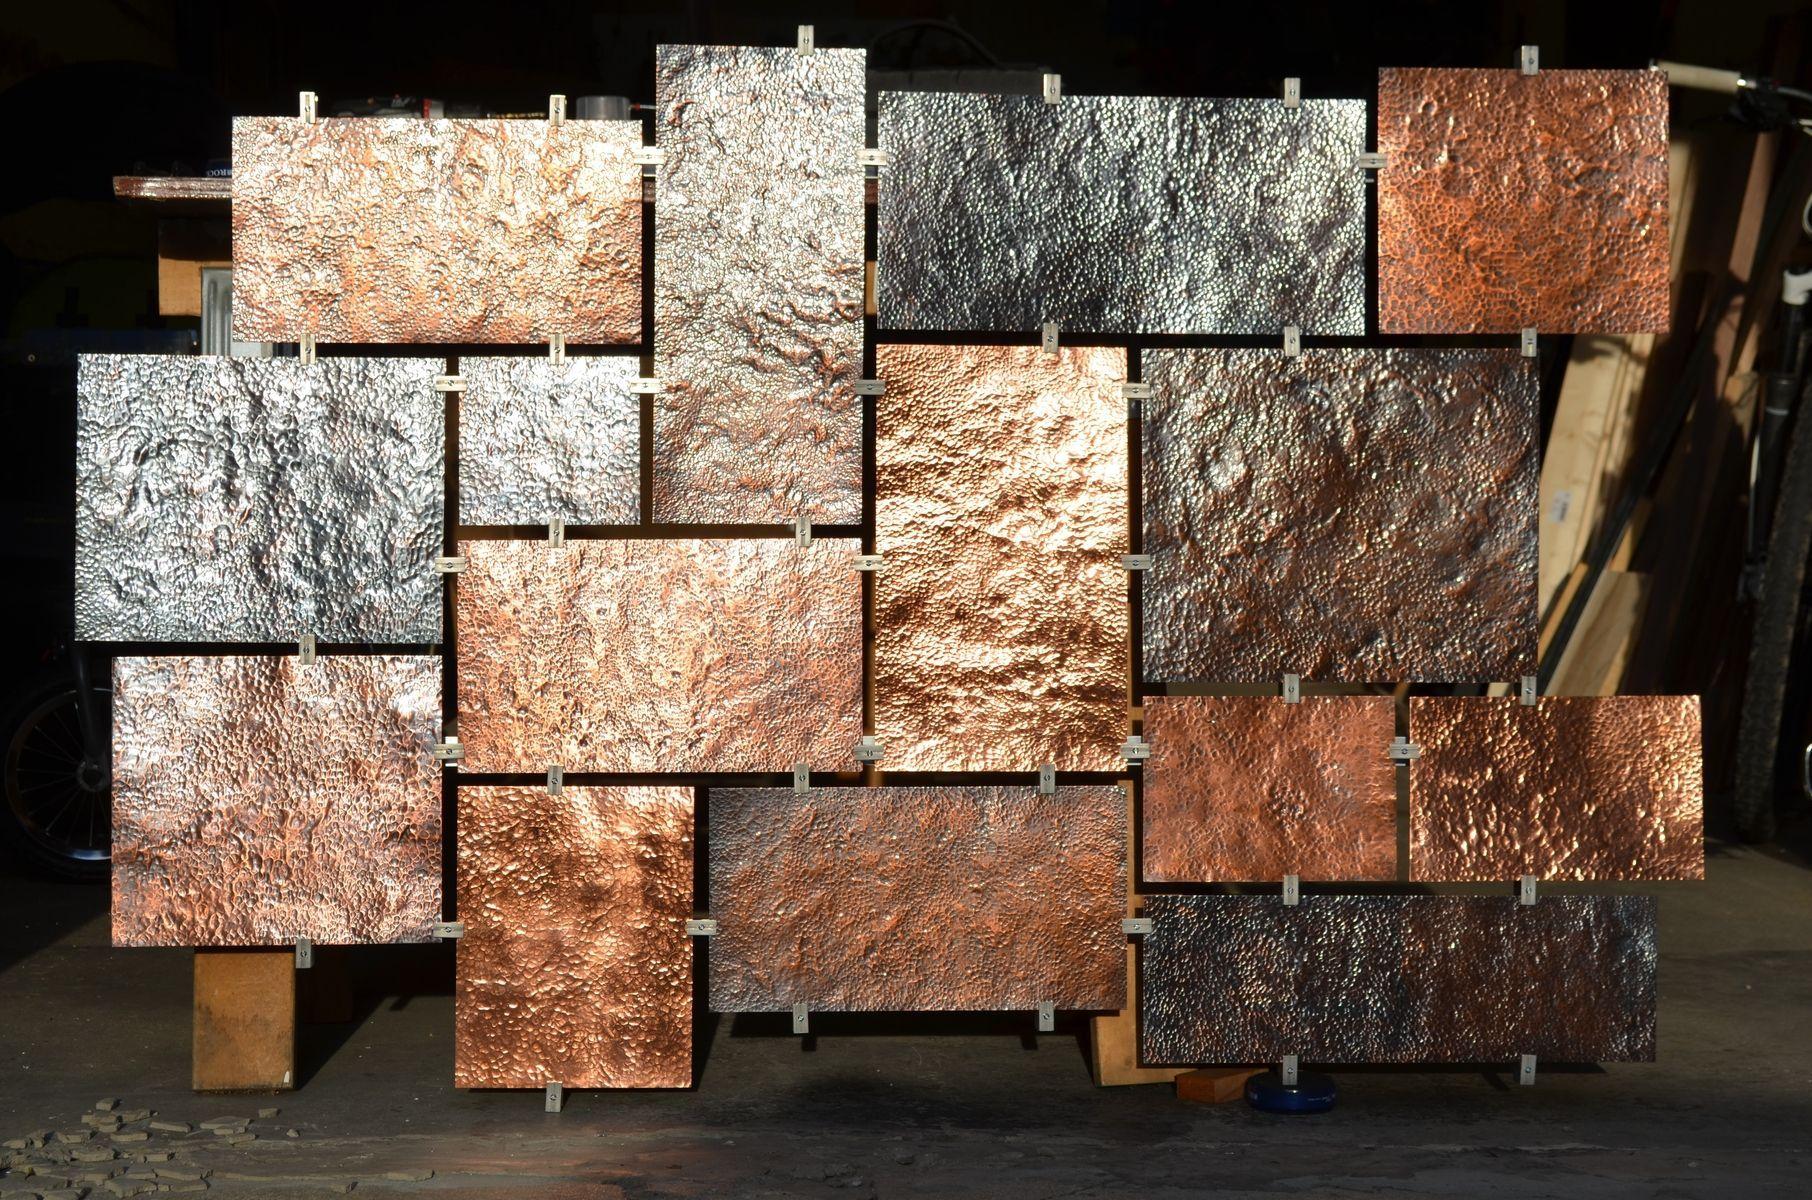 Custom Made Custom Hammered Copper Wall Art Copper Wall Art Copper Wall Decor Copper Wall